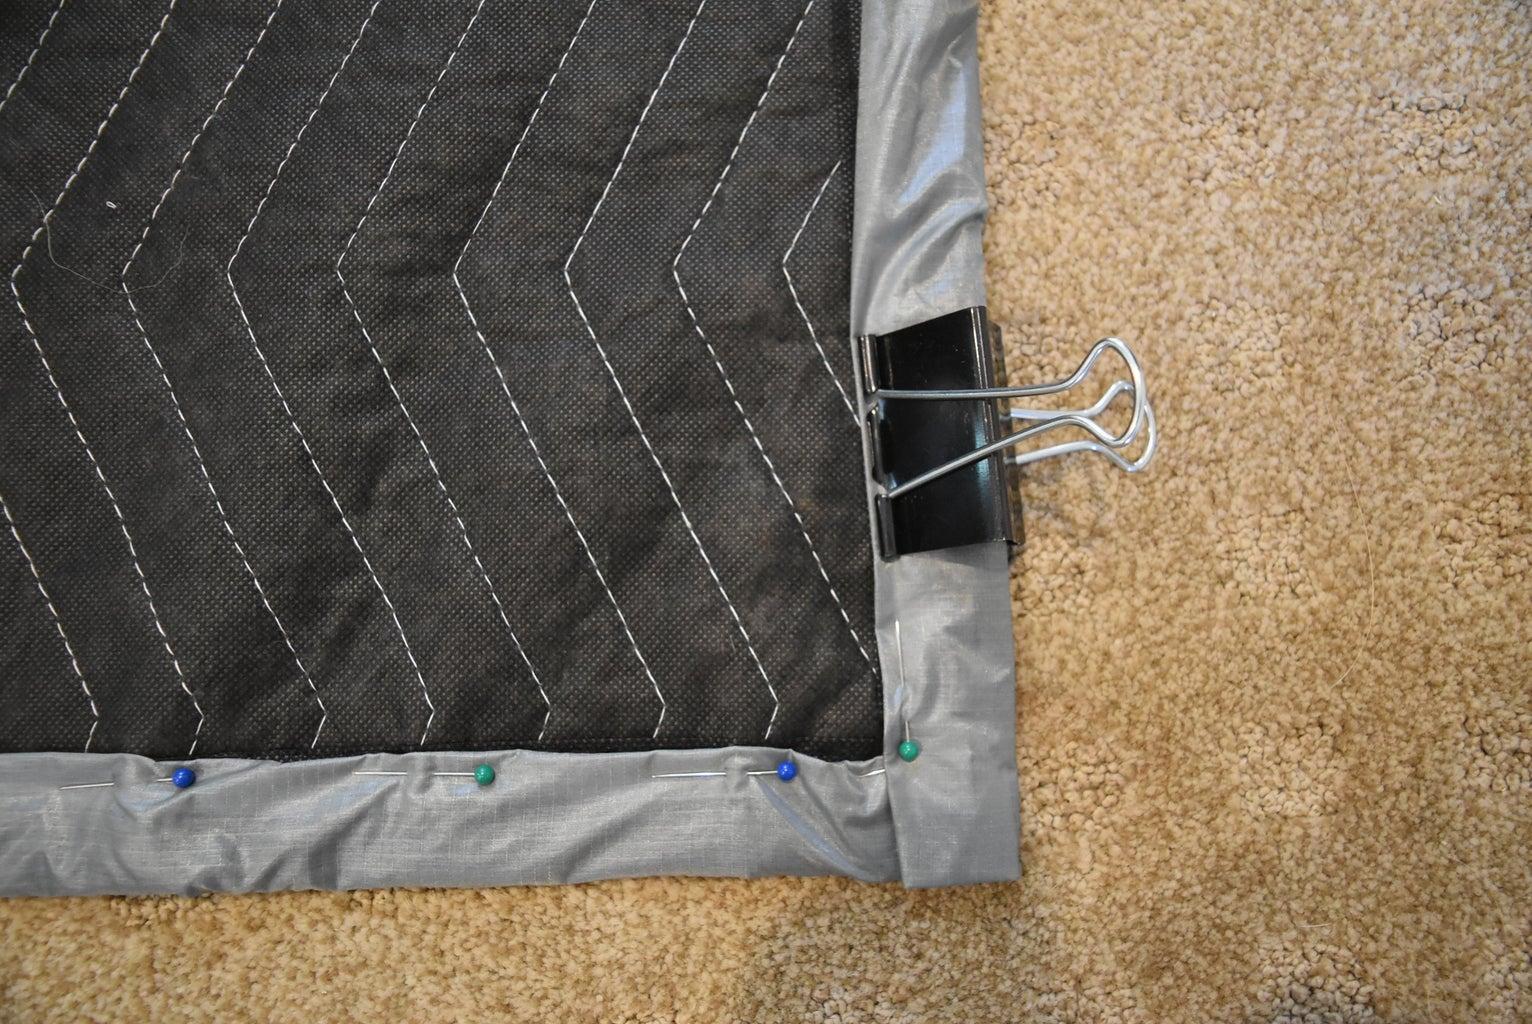 Step 3: Fold and Pin/ Clip Seam Allowance